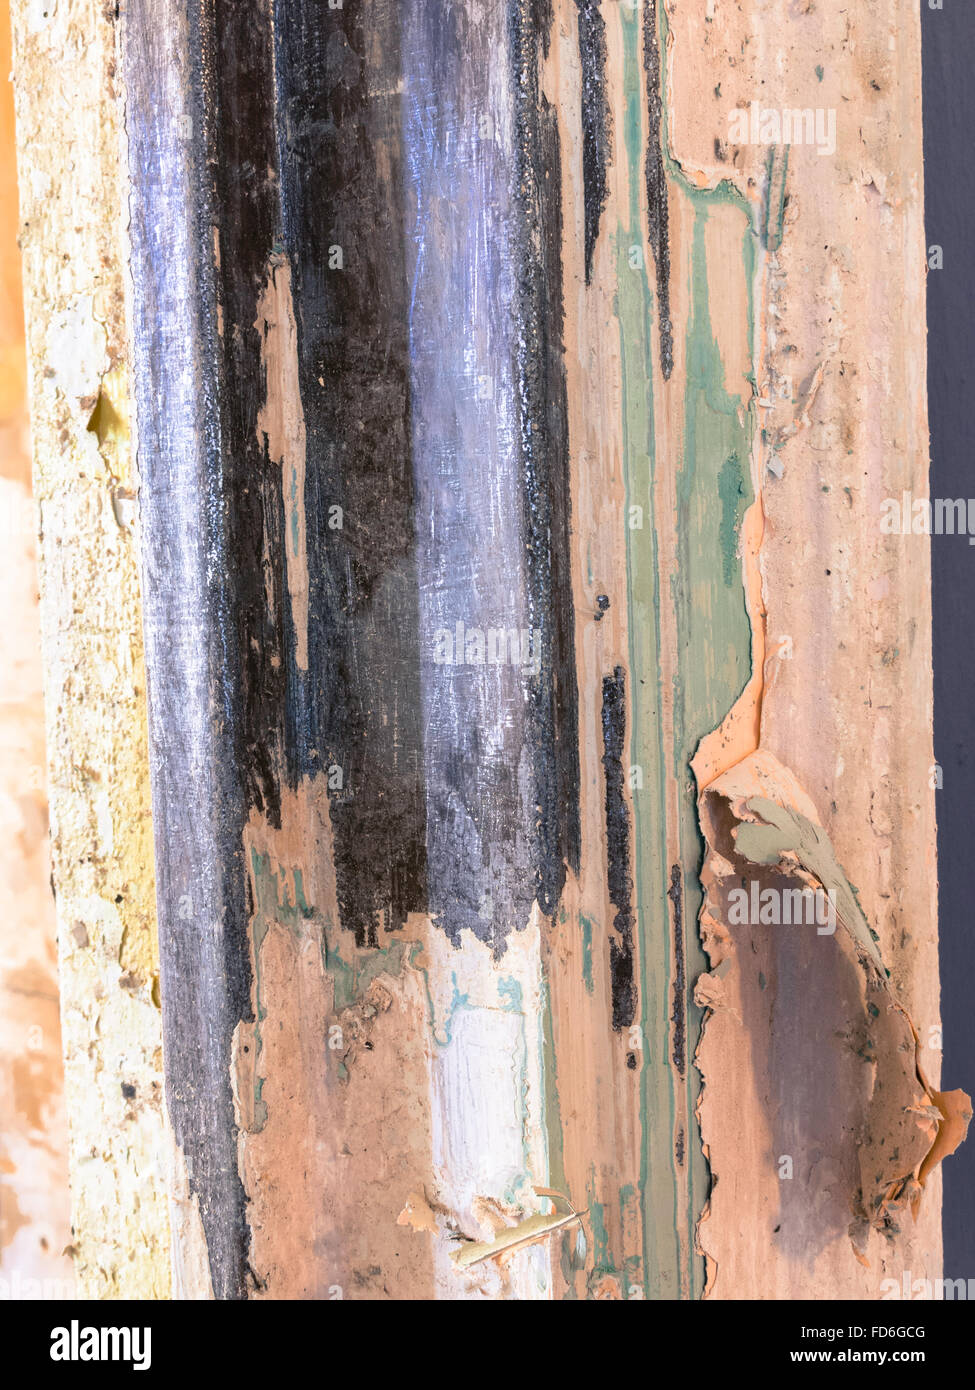 Peeling Paint on Metal Door Frame - Stock Image